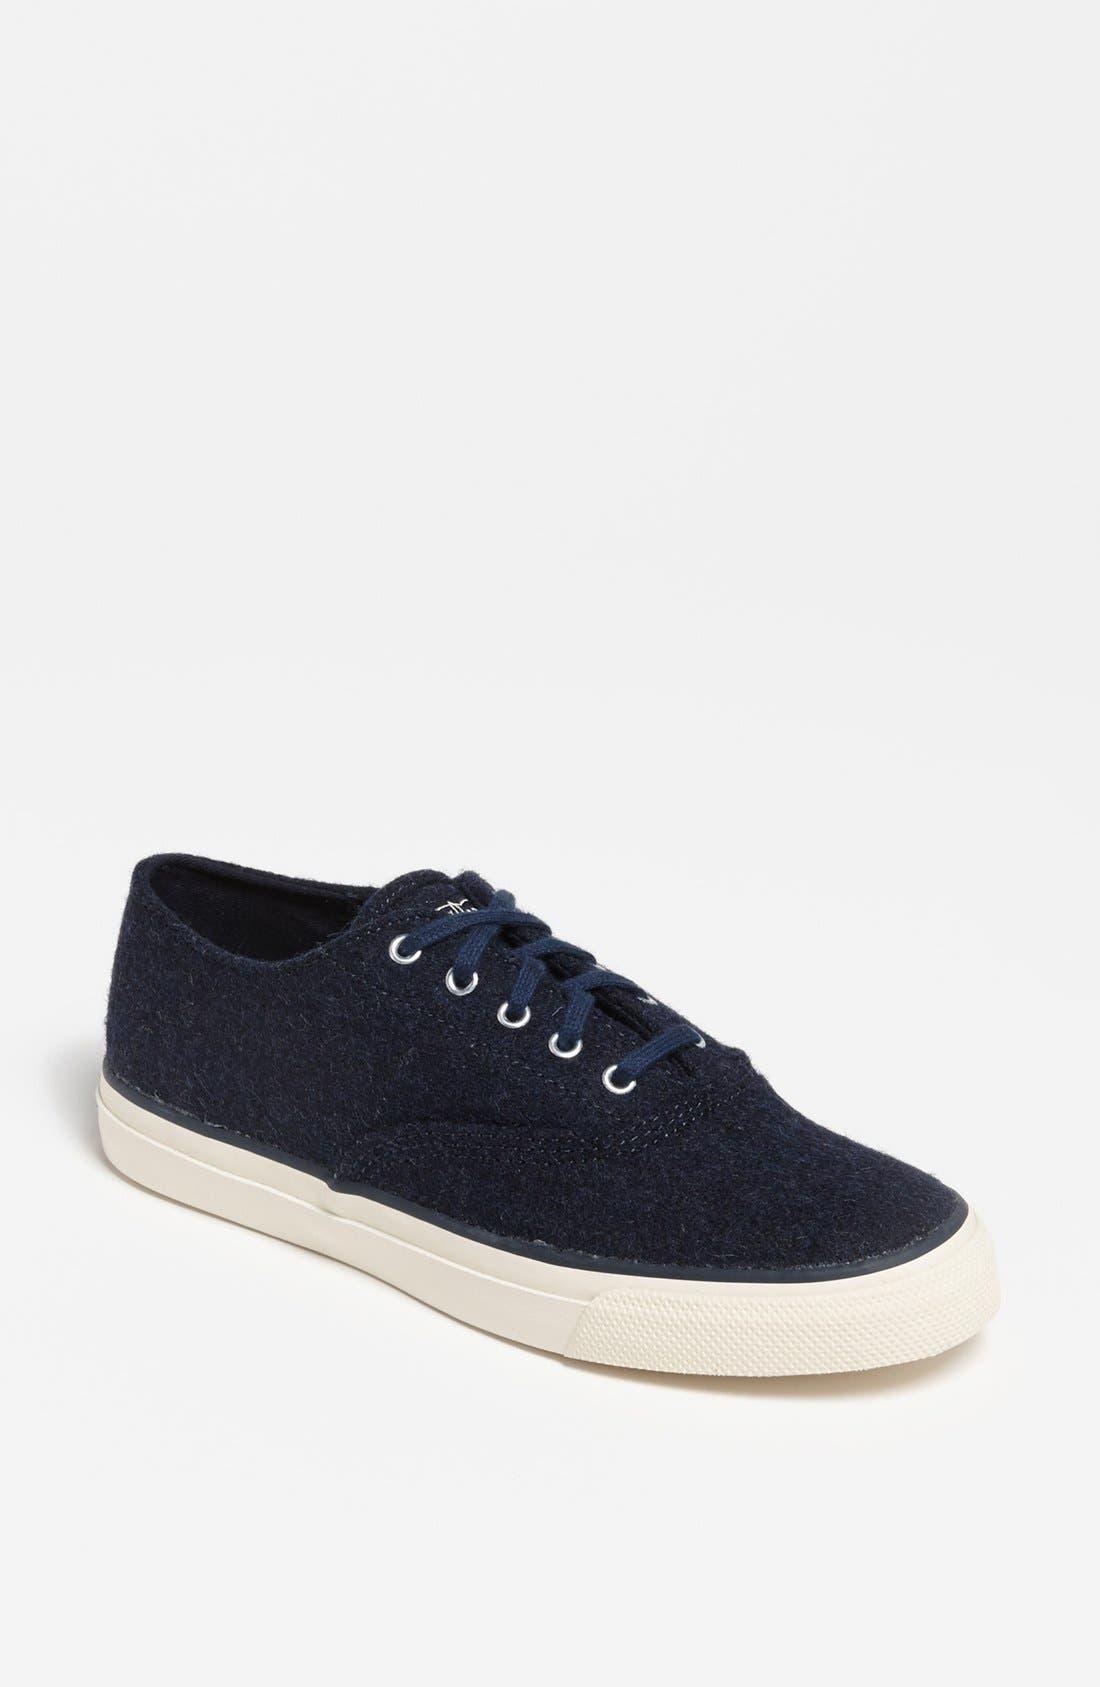 Alternate Image 1 Selected - Sperry Top-Sider® 'CVO' Sneaker